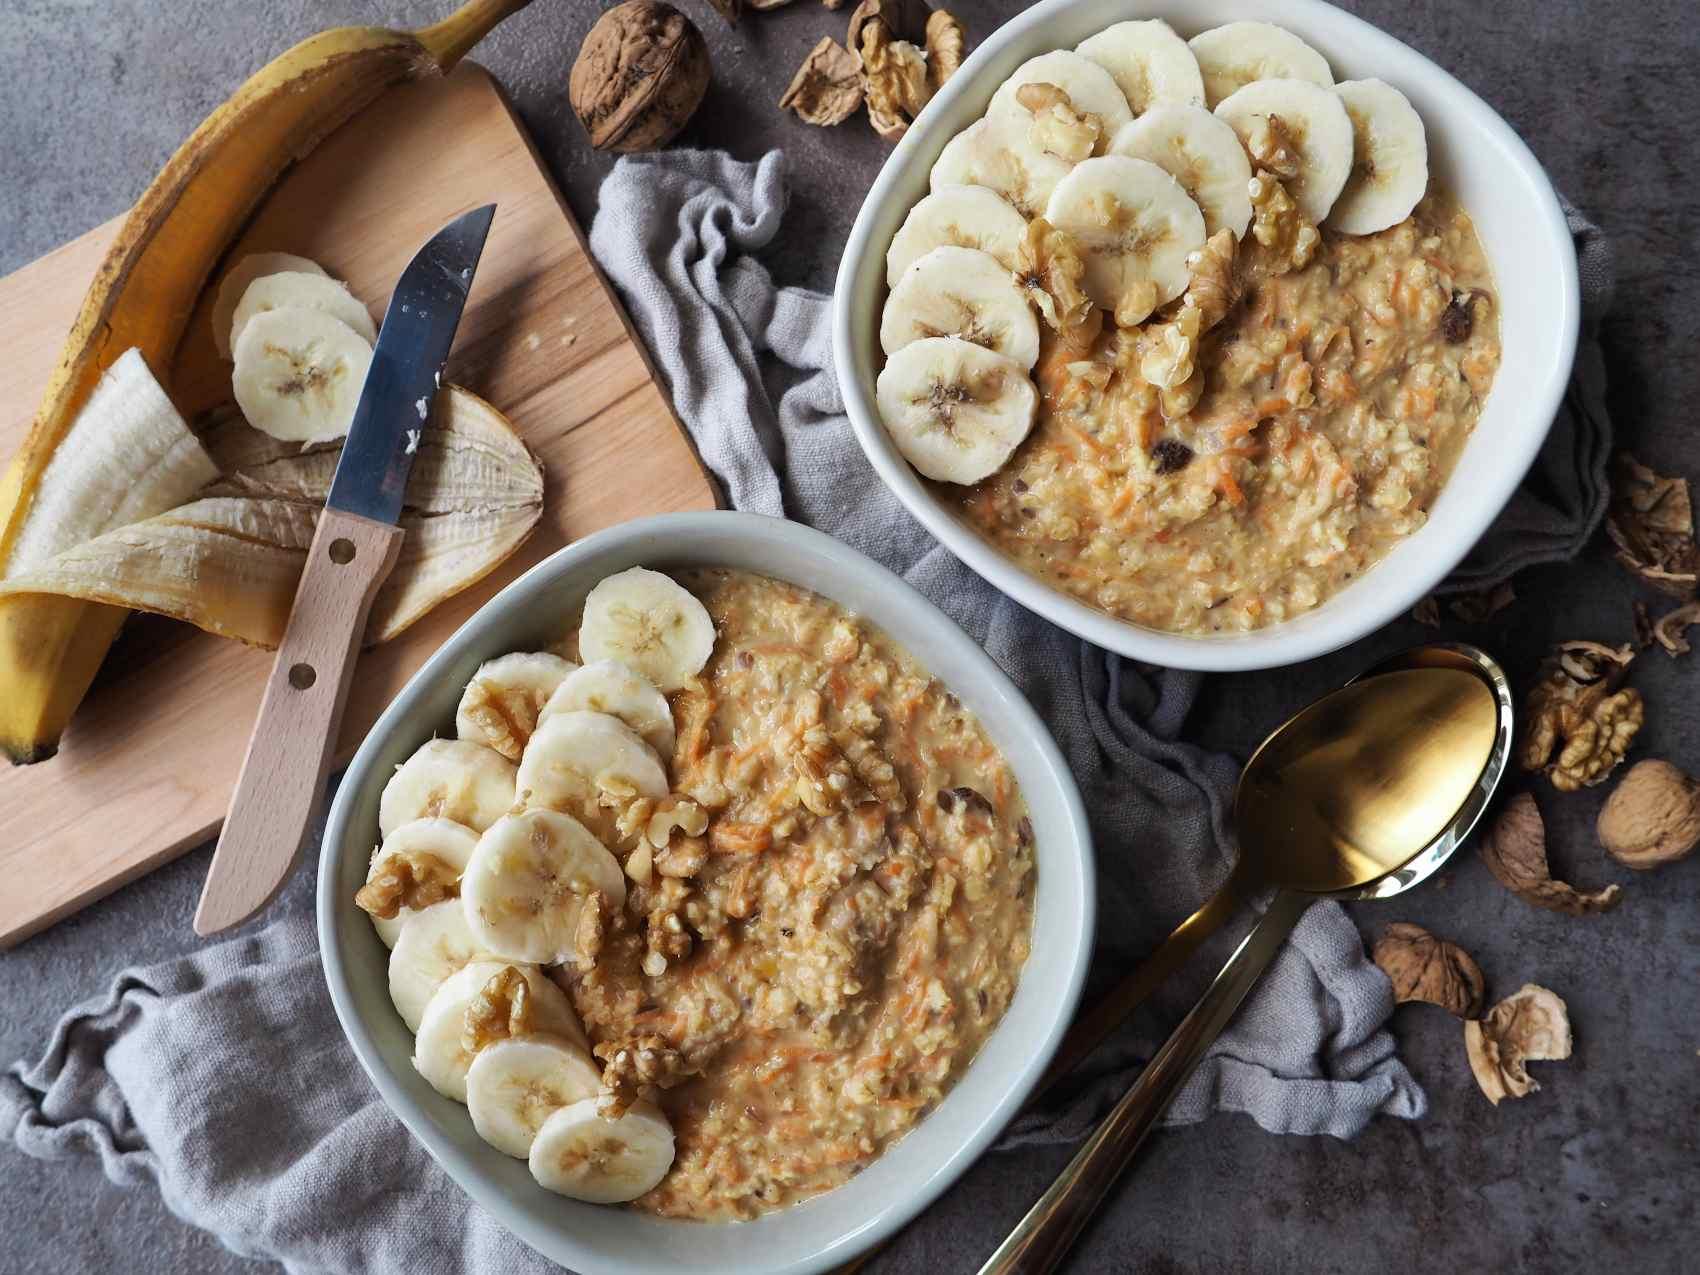 Veganes Apfel-Möhren-Porridge mit Ingwer